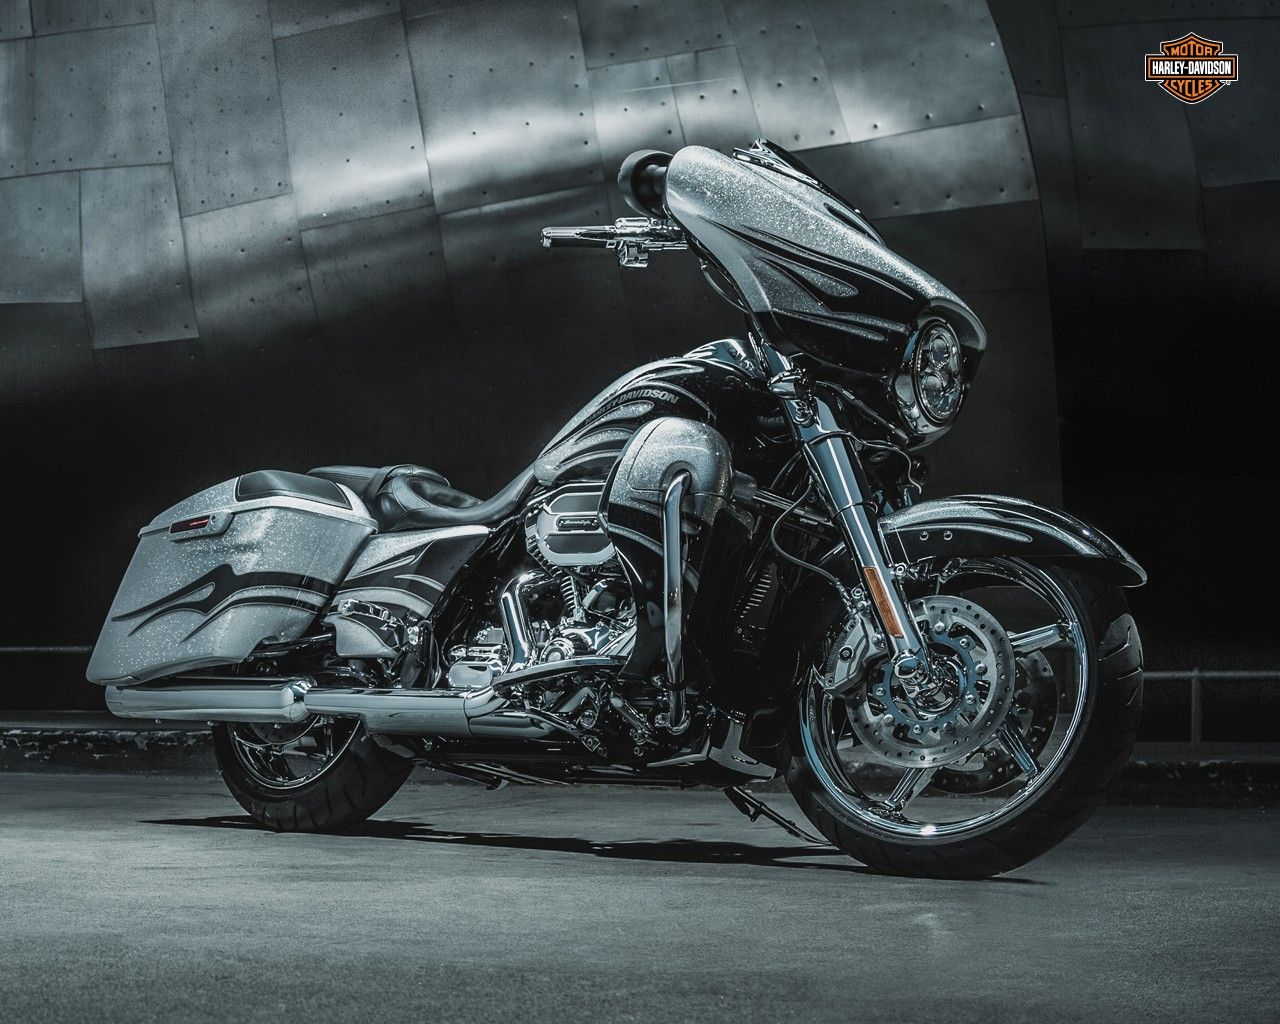 Harley Davidson Bagger Wallpapers Top Free Harley Davidson Bagger Backgrounds Wallpaperaccess